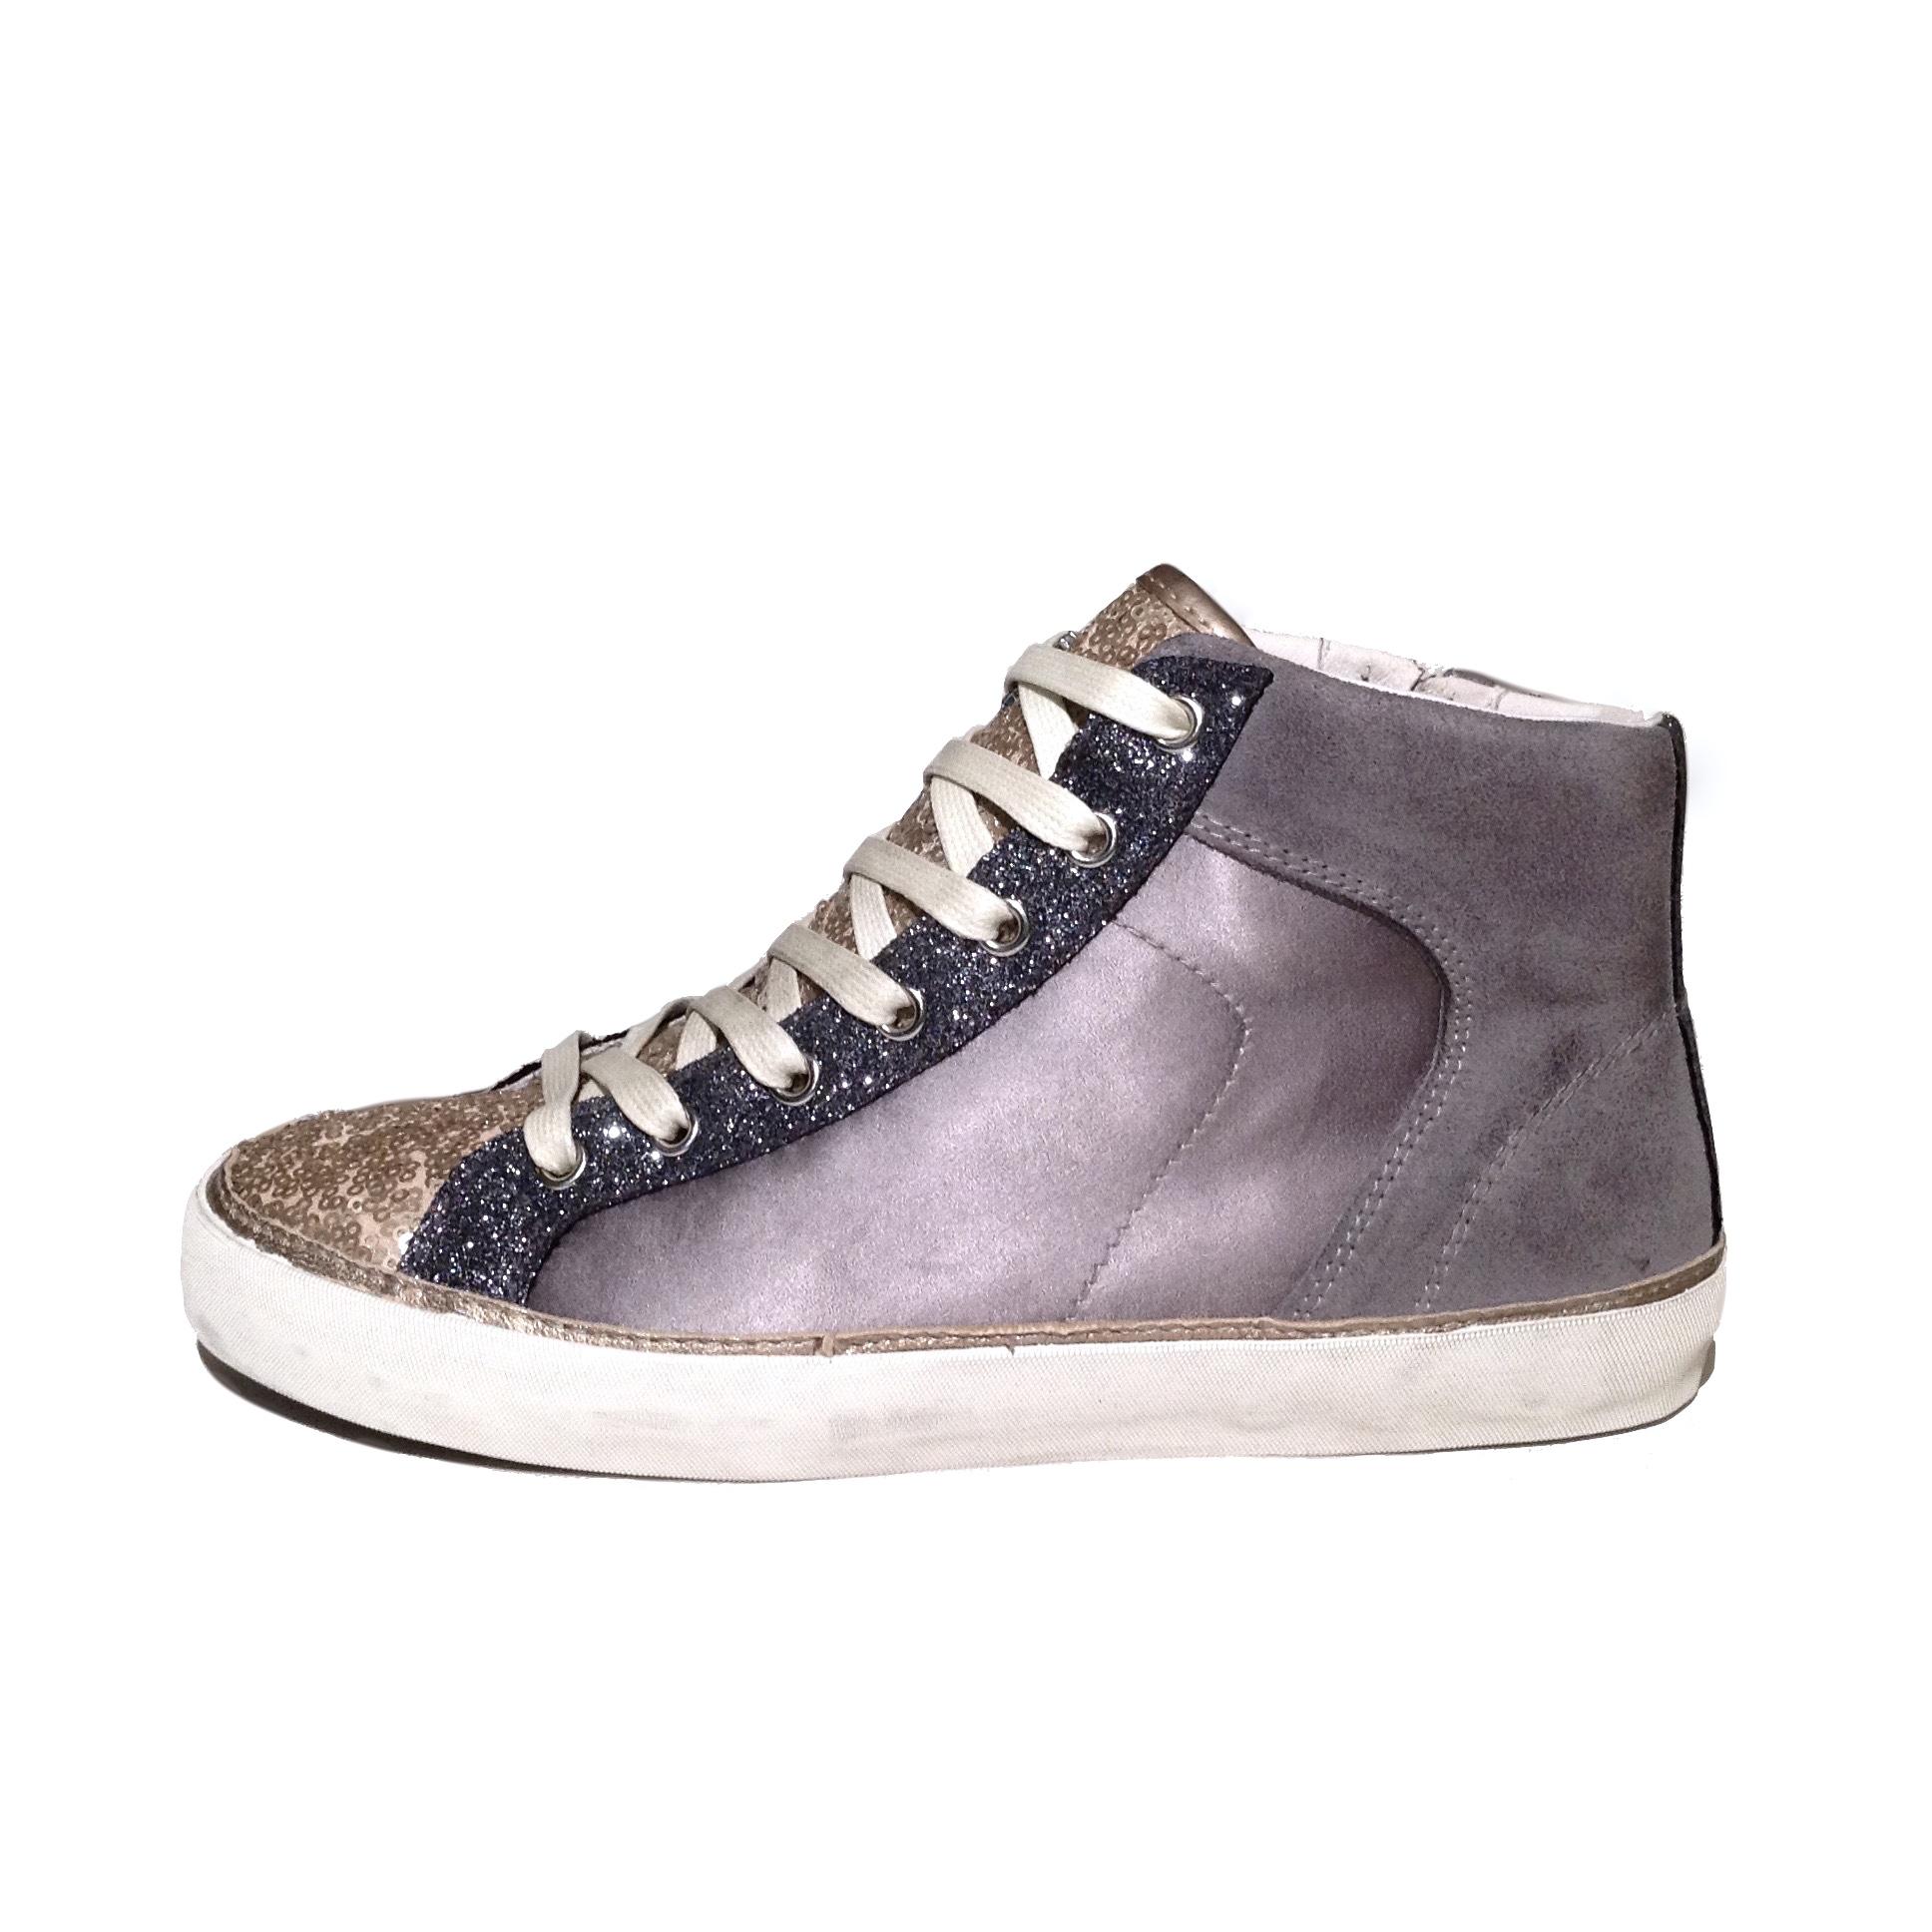 crime london sneaker 25041s16 anthra hightop sneaker f r frauen ebay. Black Bedroom Furniture Sets. Home Design Ideas